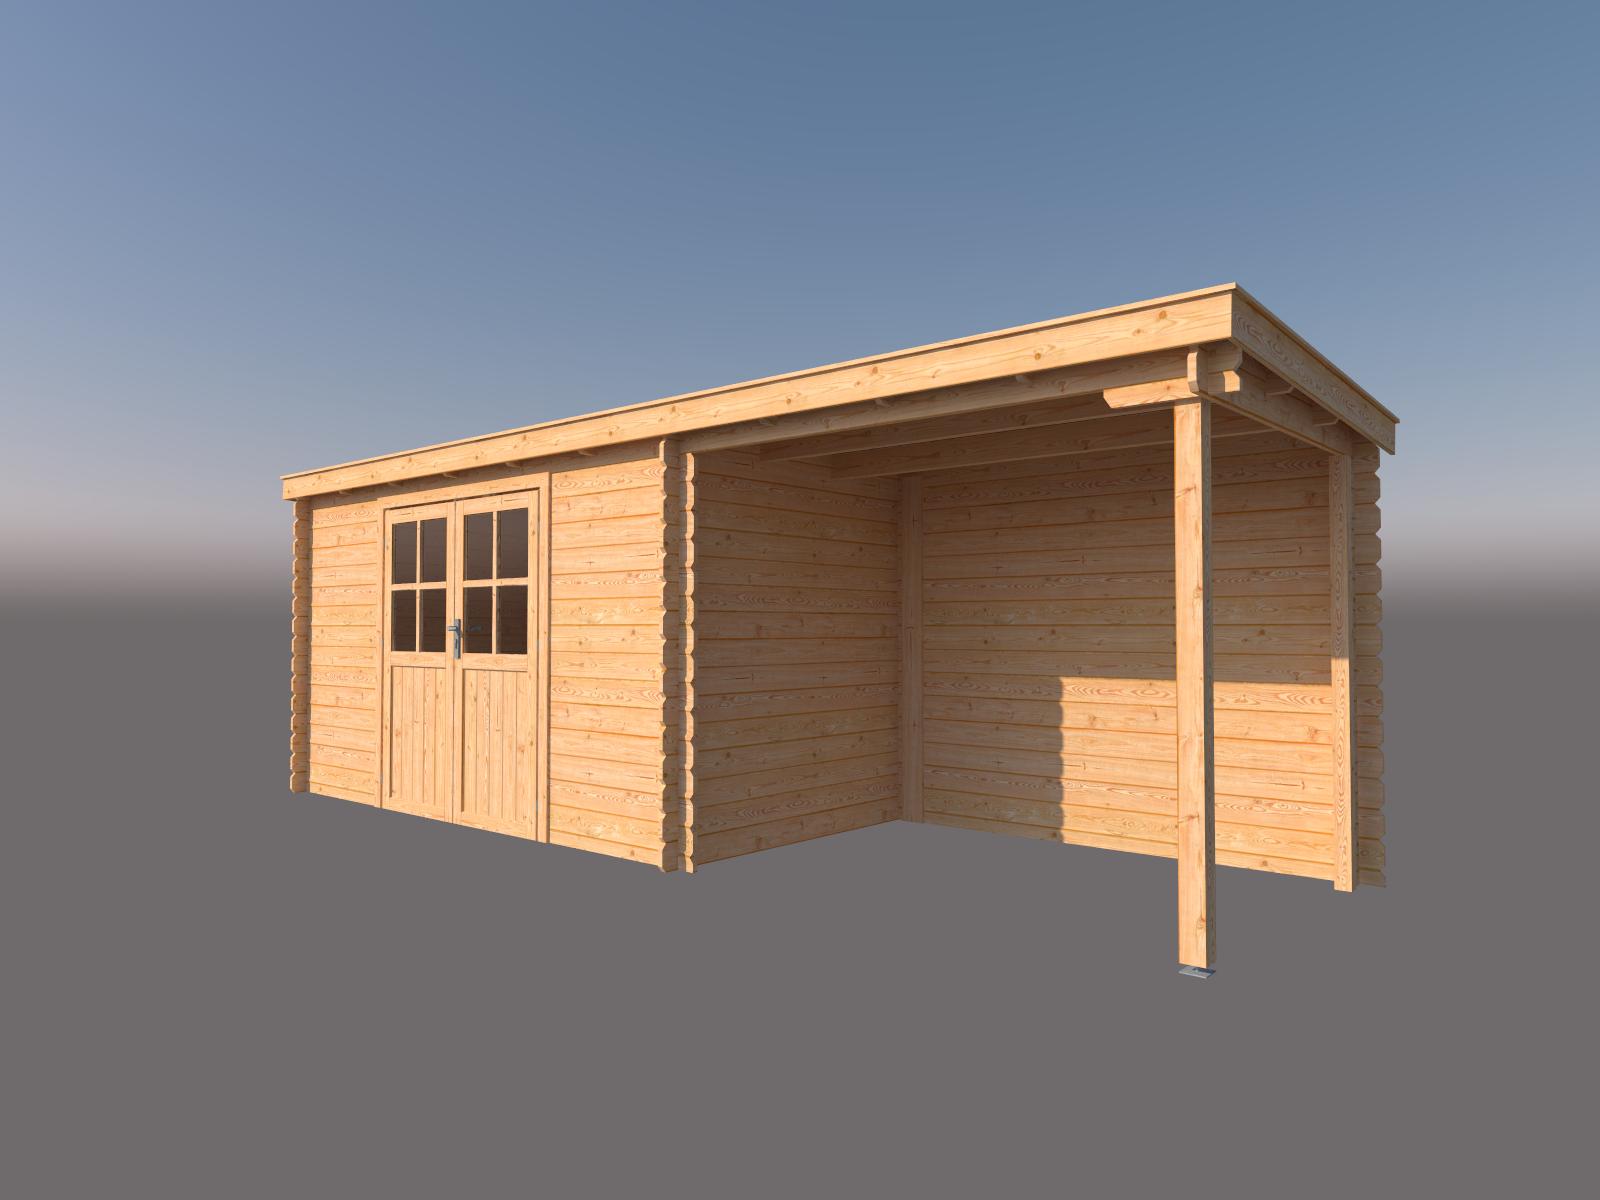 DWF Blokhut met overkapping lessenaar dak 400 x 200 + 250cm